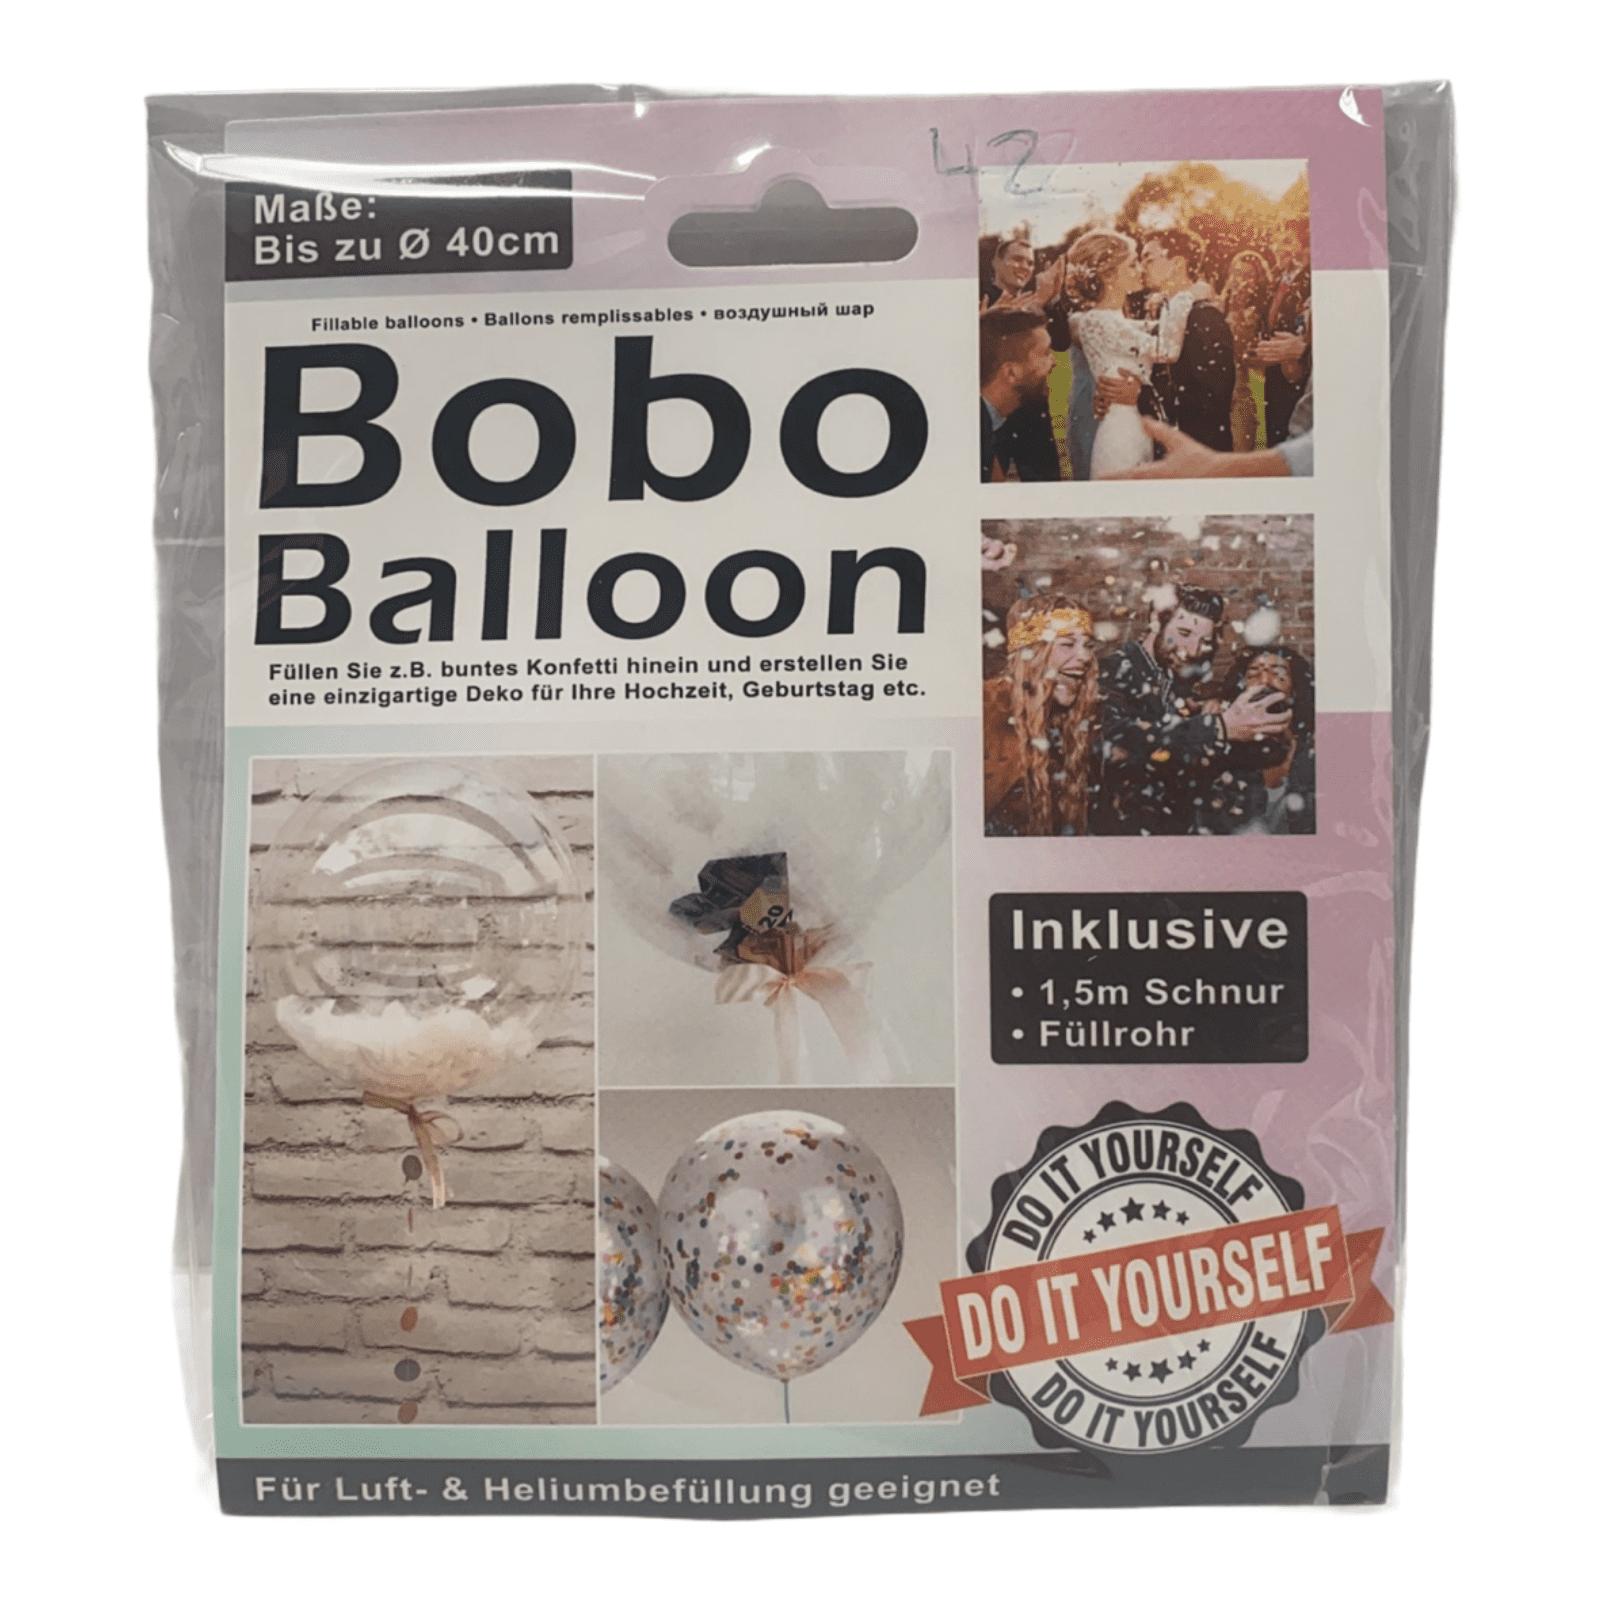 DIY Bobo-Ballon zum Befüllen